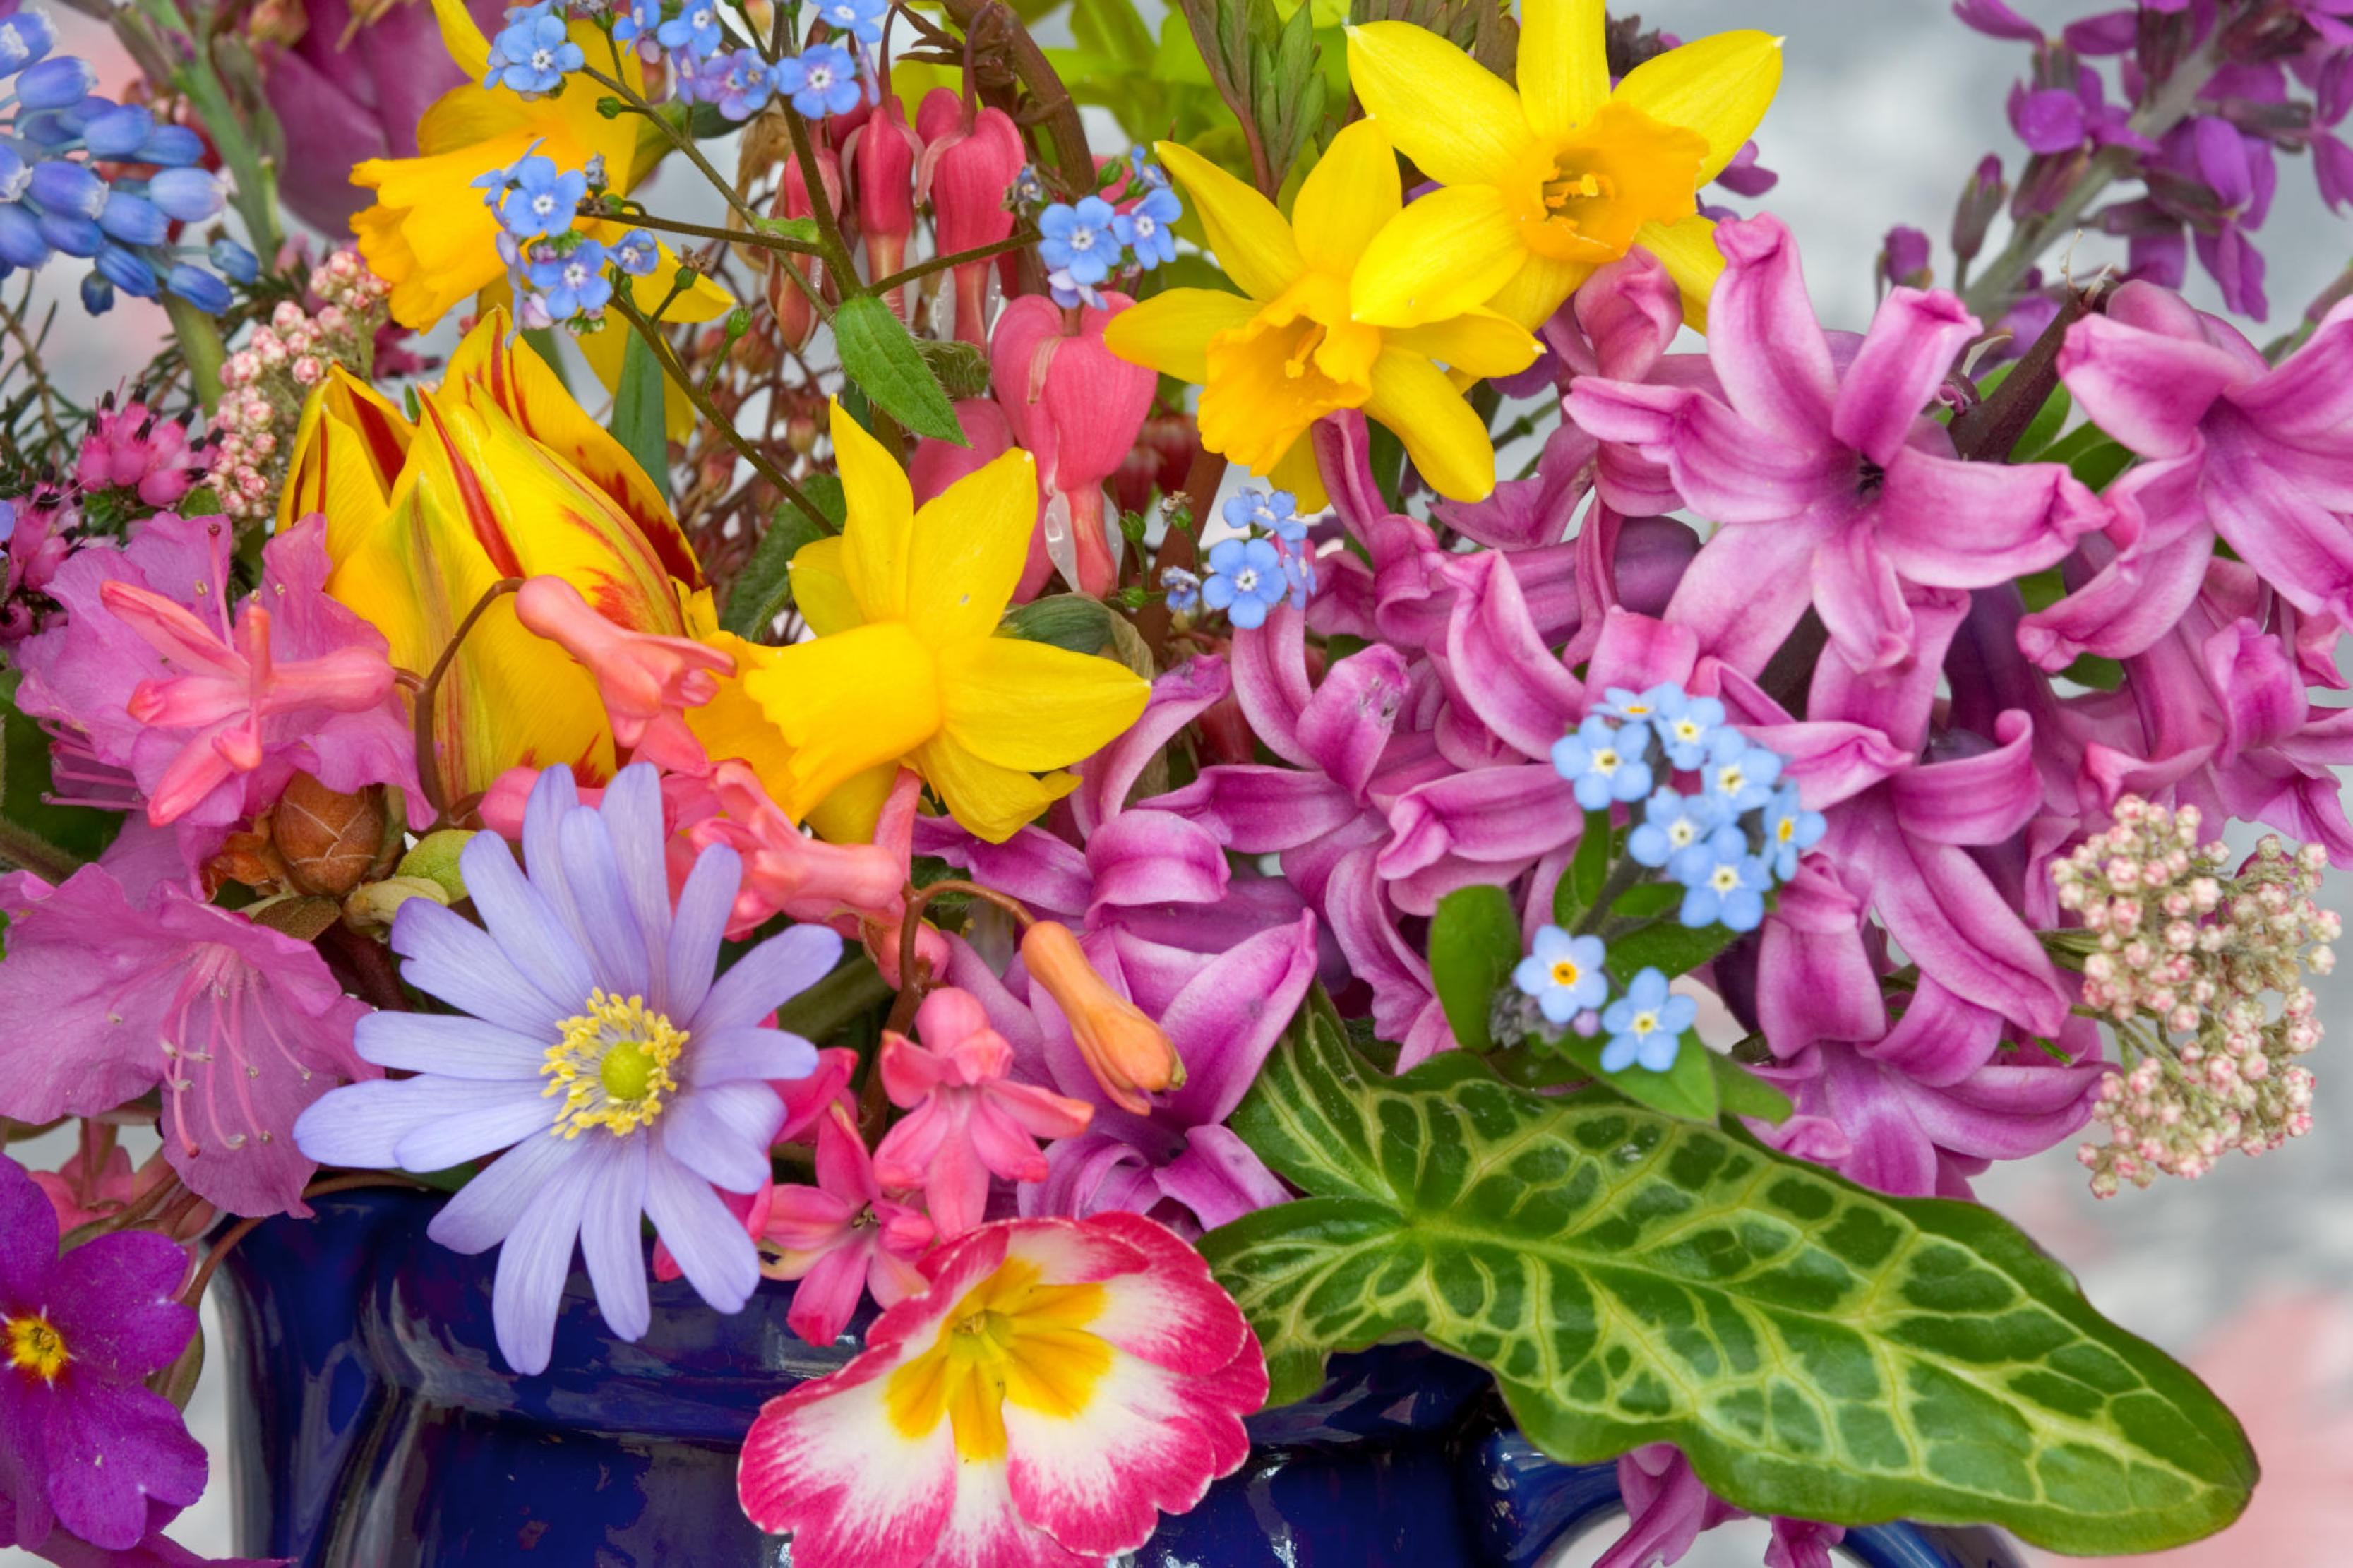 بالصور اجمل صور مناظر زهور 20160625 585